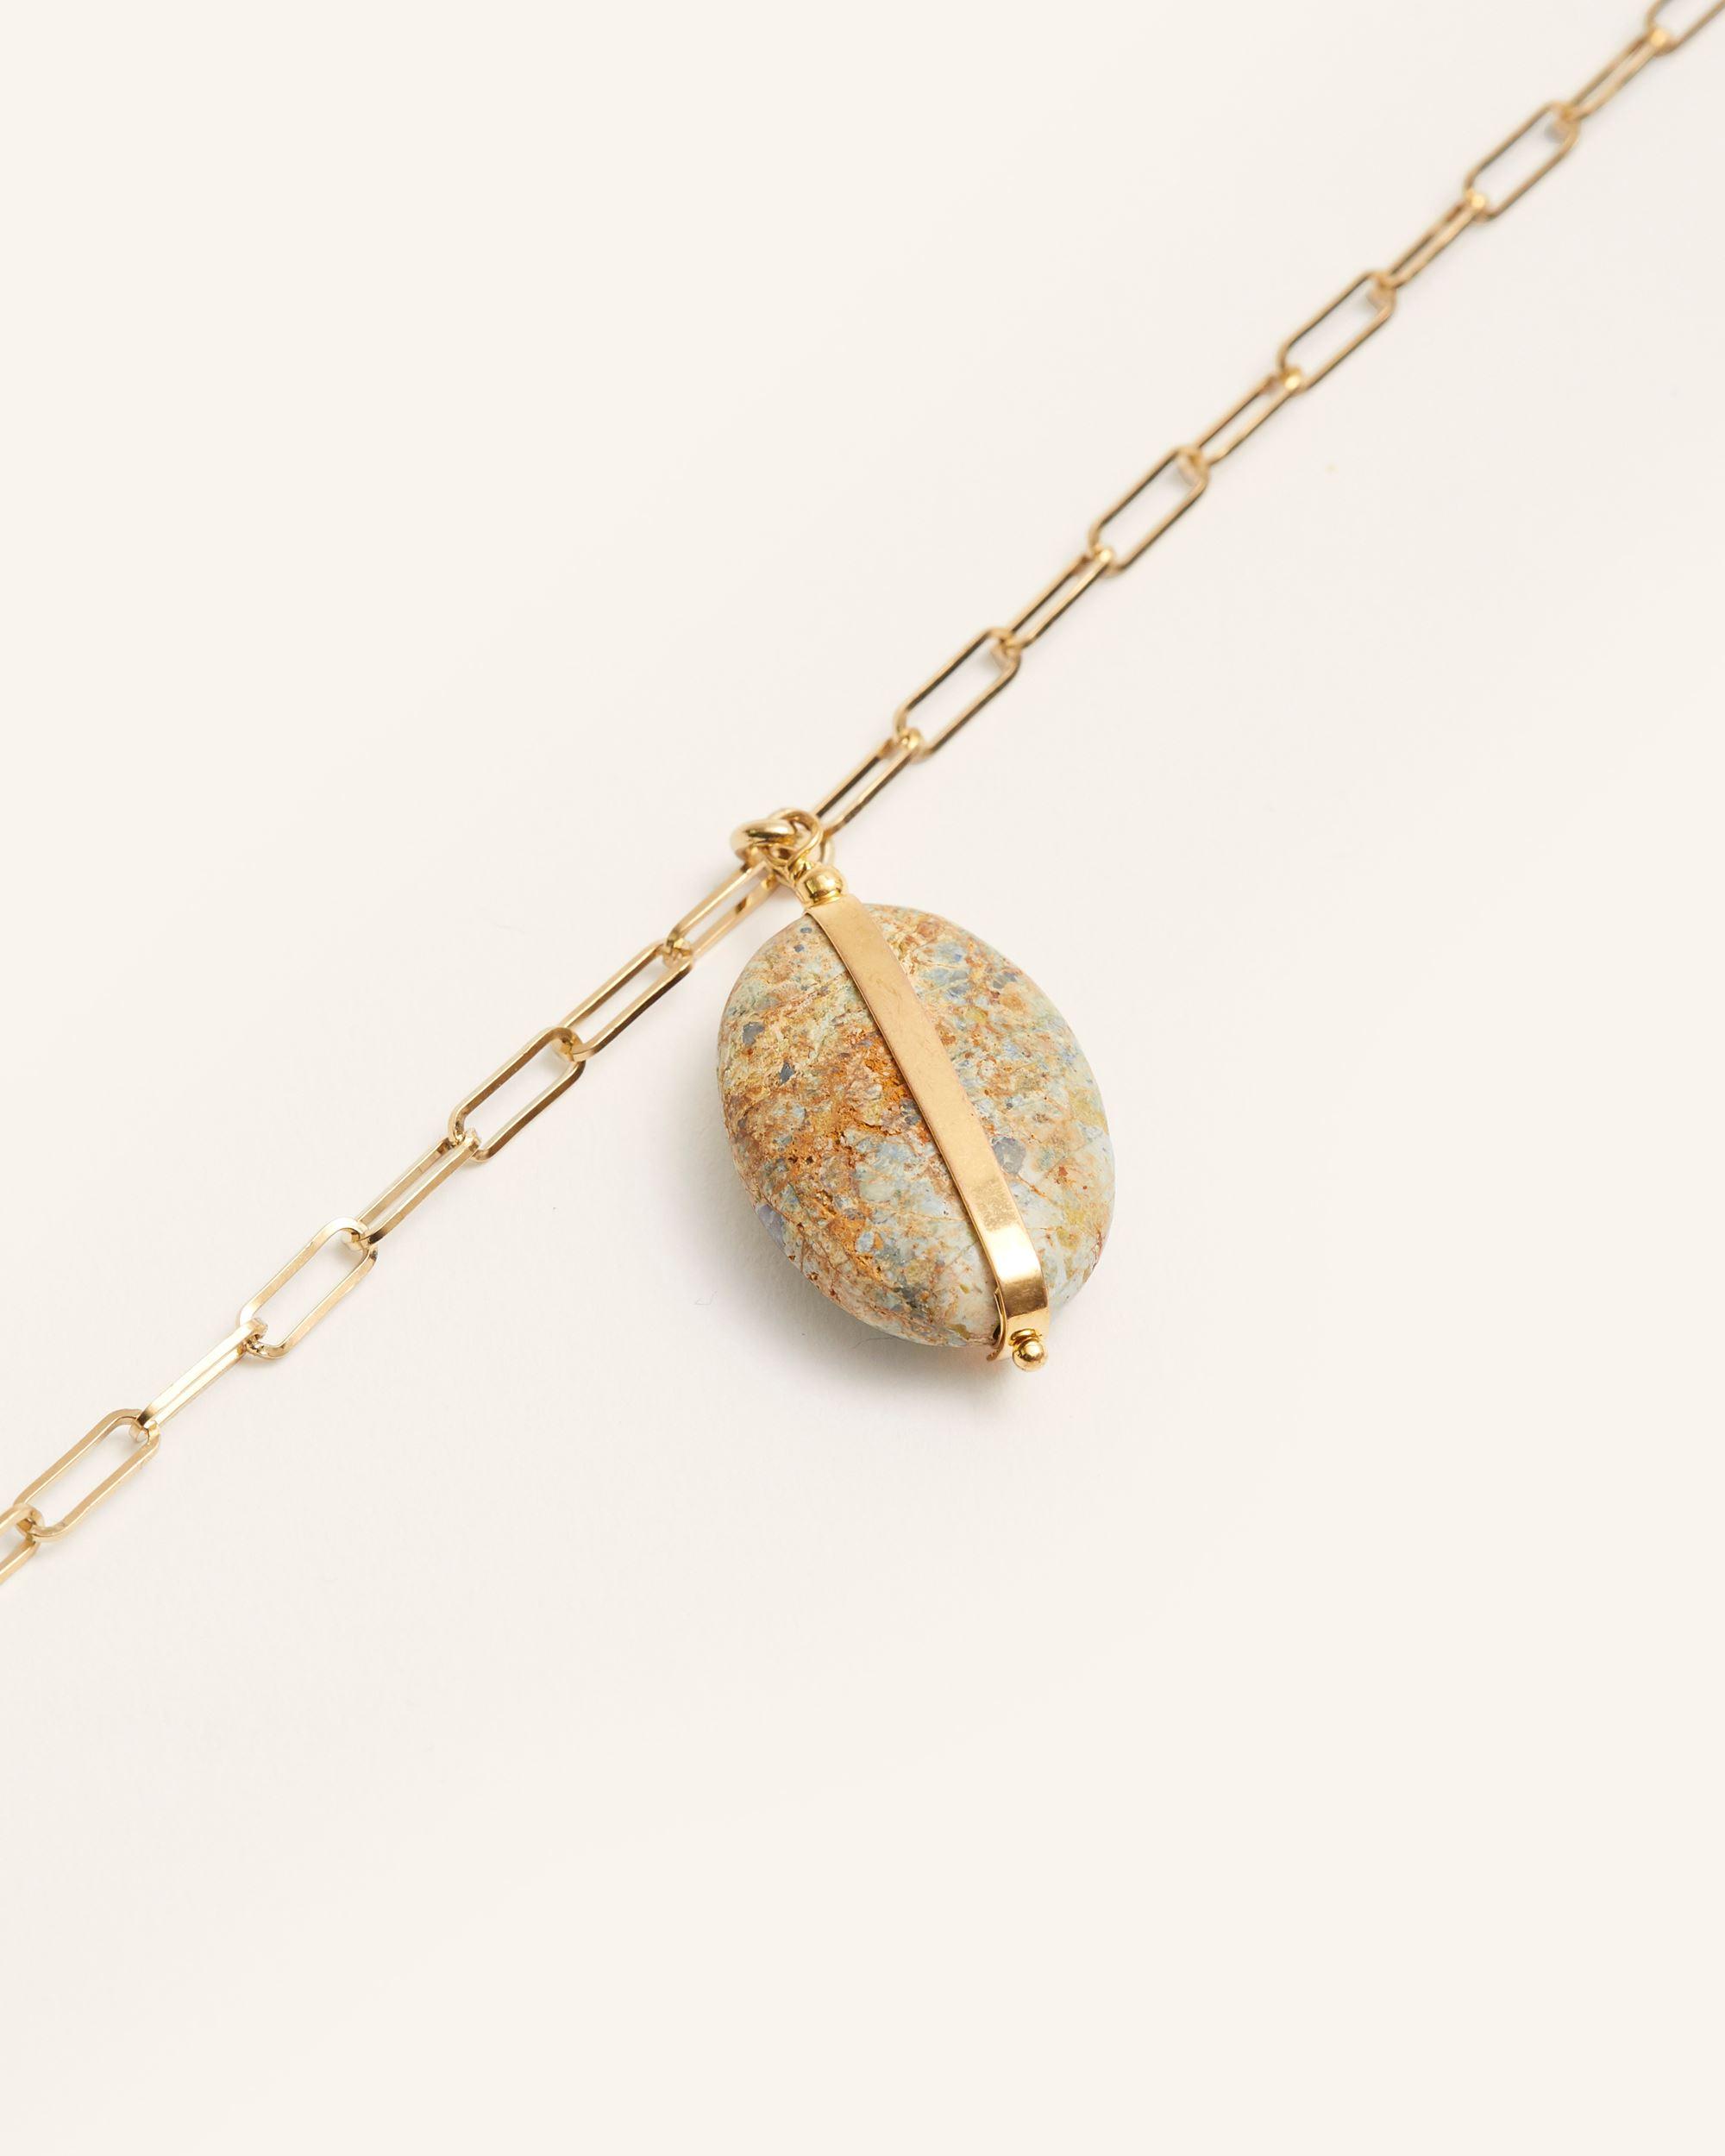 Halskette, Verdigris, Isabel Marant, Stone